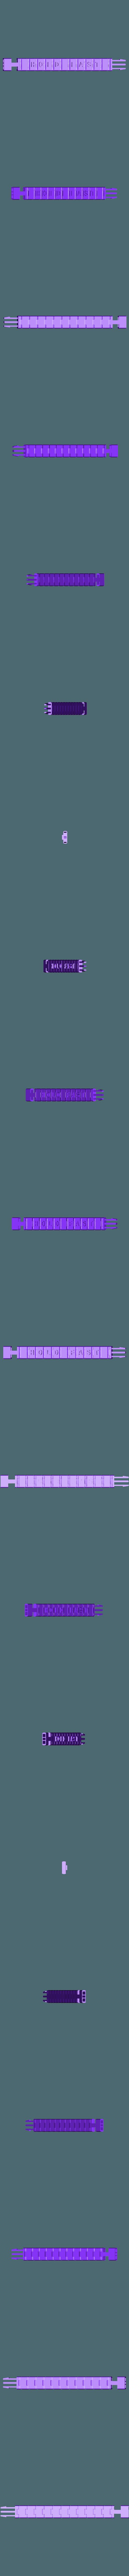 PiPCollar_TextExtruded.stl Download free SCAD file Customizable Bracelet • 3D print model, Zippityboomba